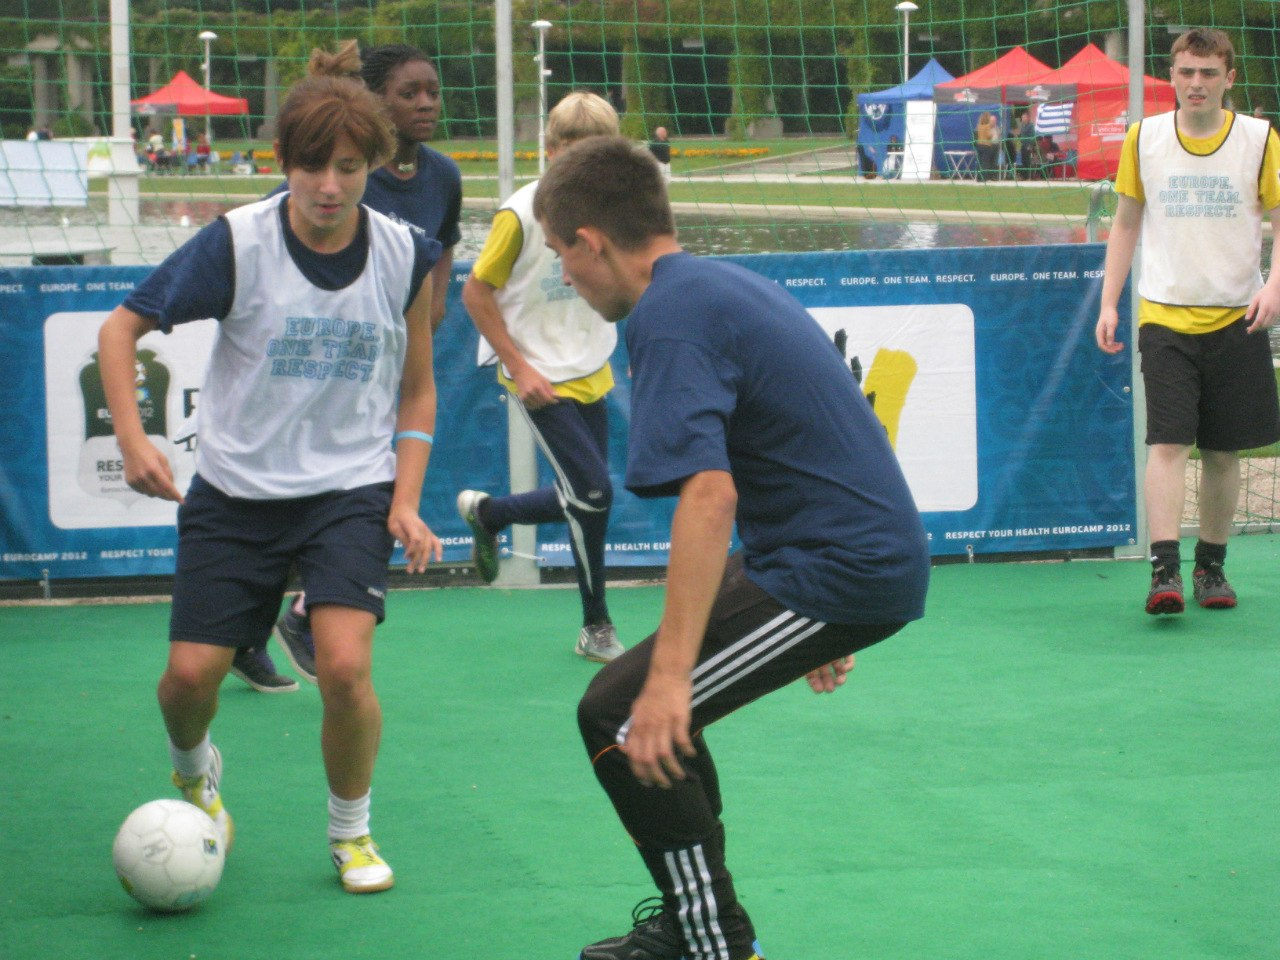 Беличанка, Коцюбинське, EUROCAMP 2012, streetfootballworld, Poland, uefa, Euro 2012, Біличанка, RESPECT your HEALTH, Wroclaw